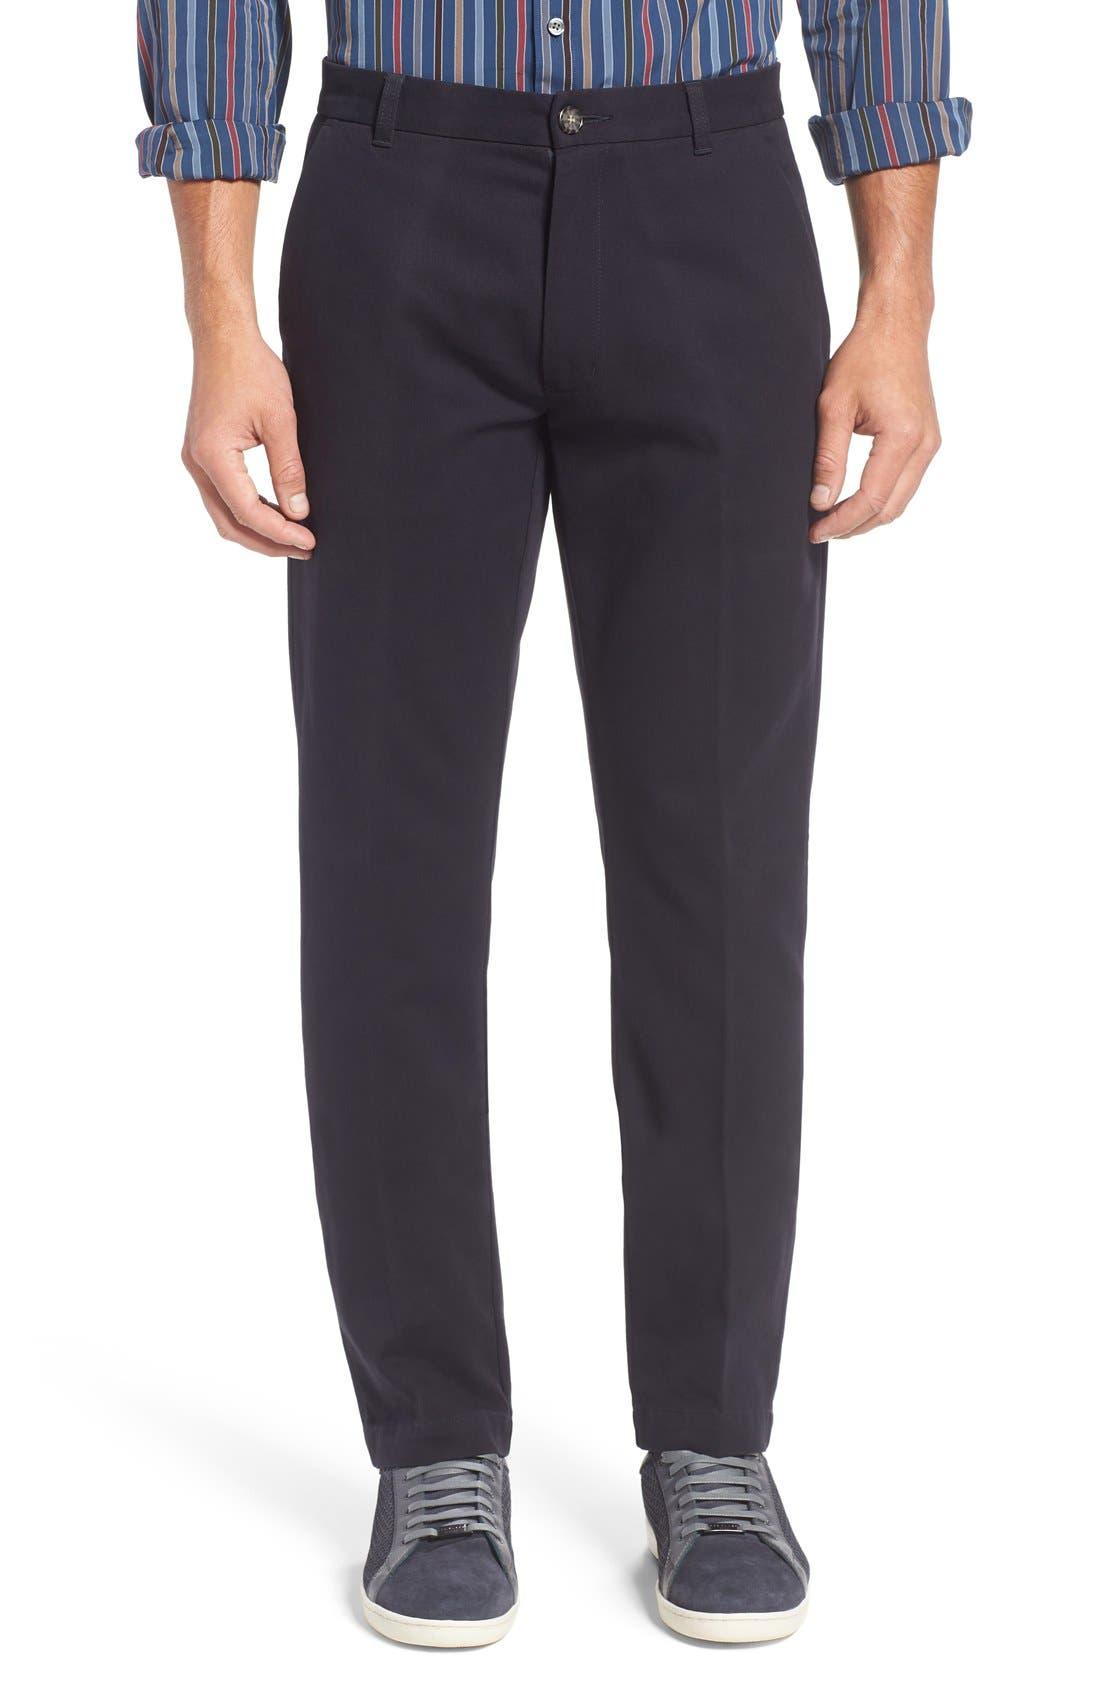 Rodd & Gunn 'Brymer' Straight Leg Pants